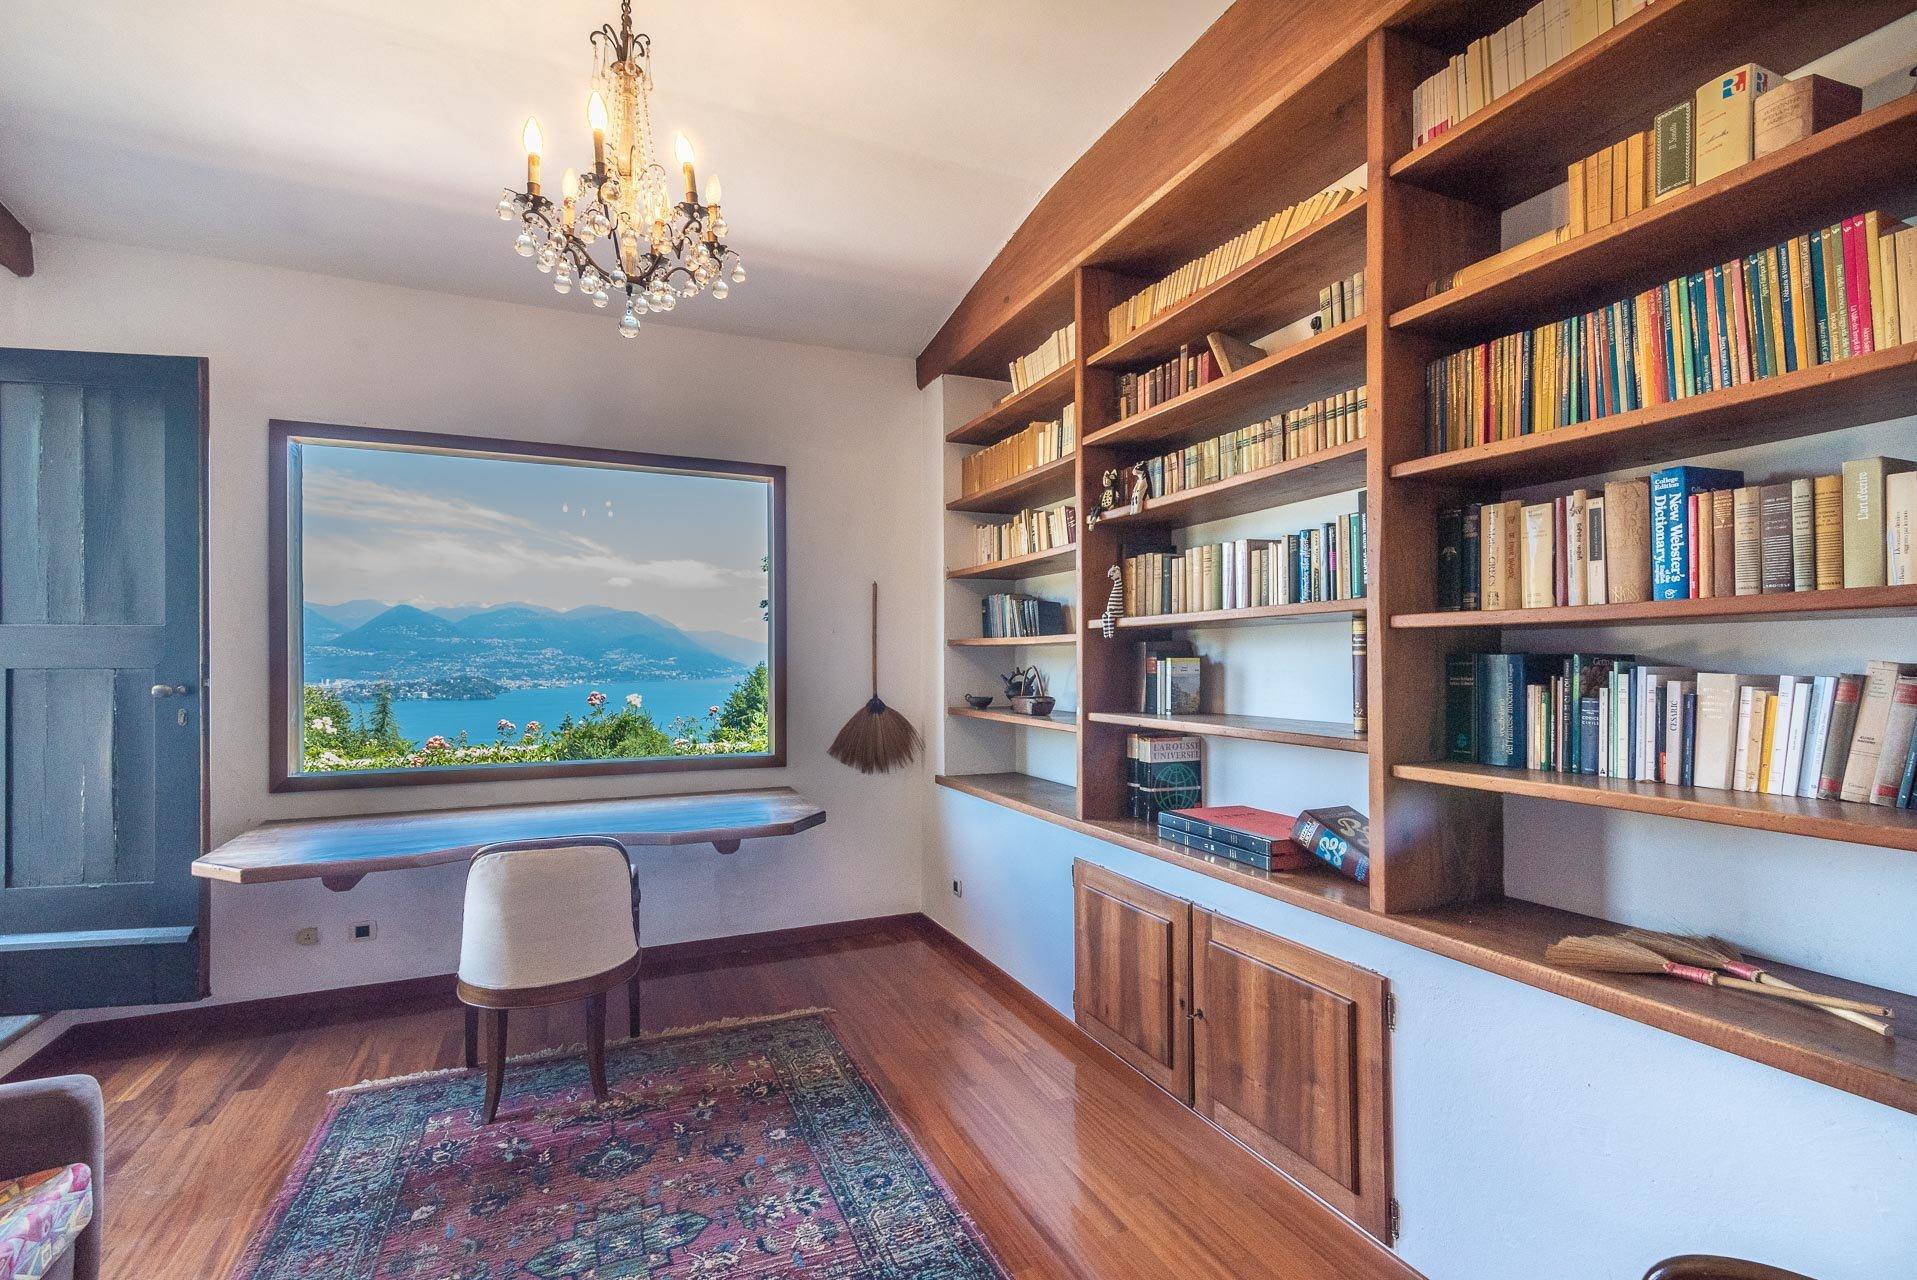 Elegant lake view villa for sale in Stresa - study